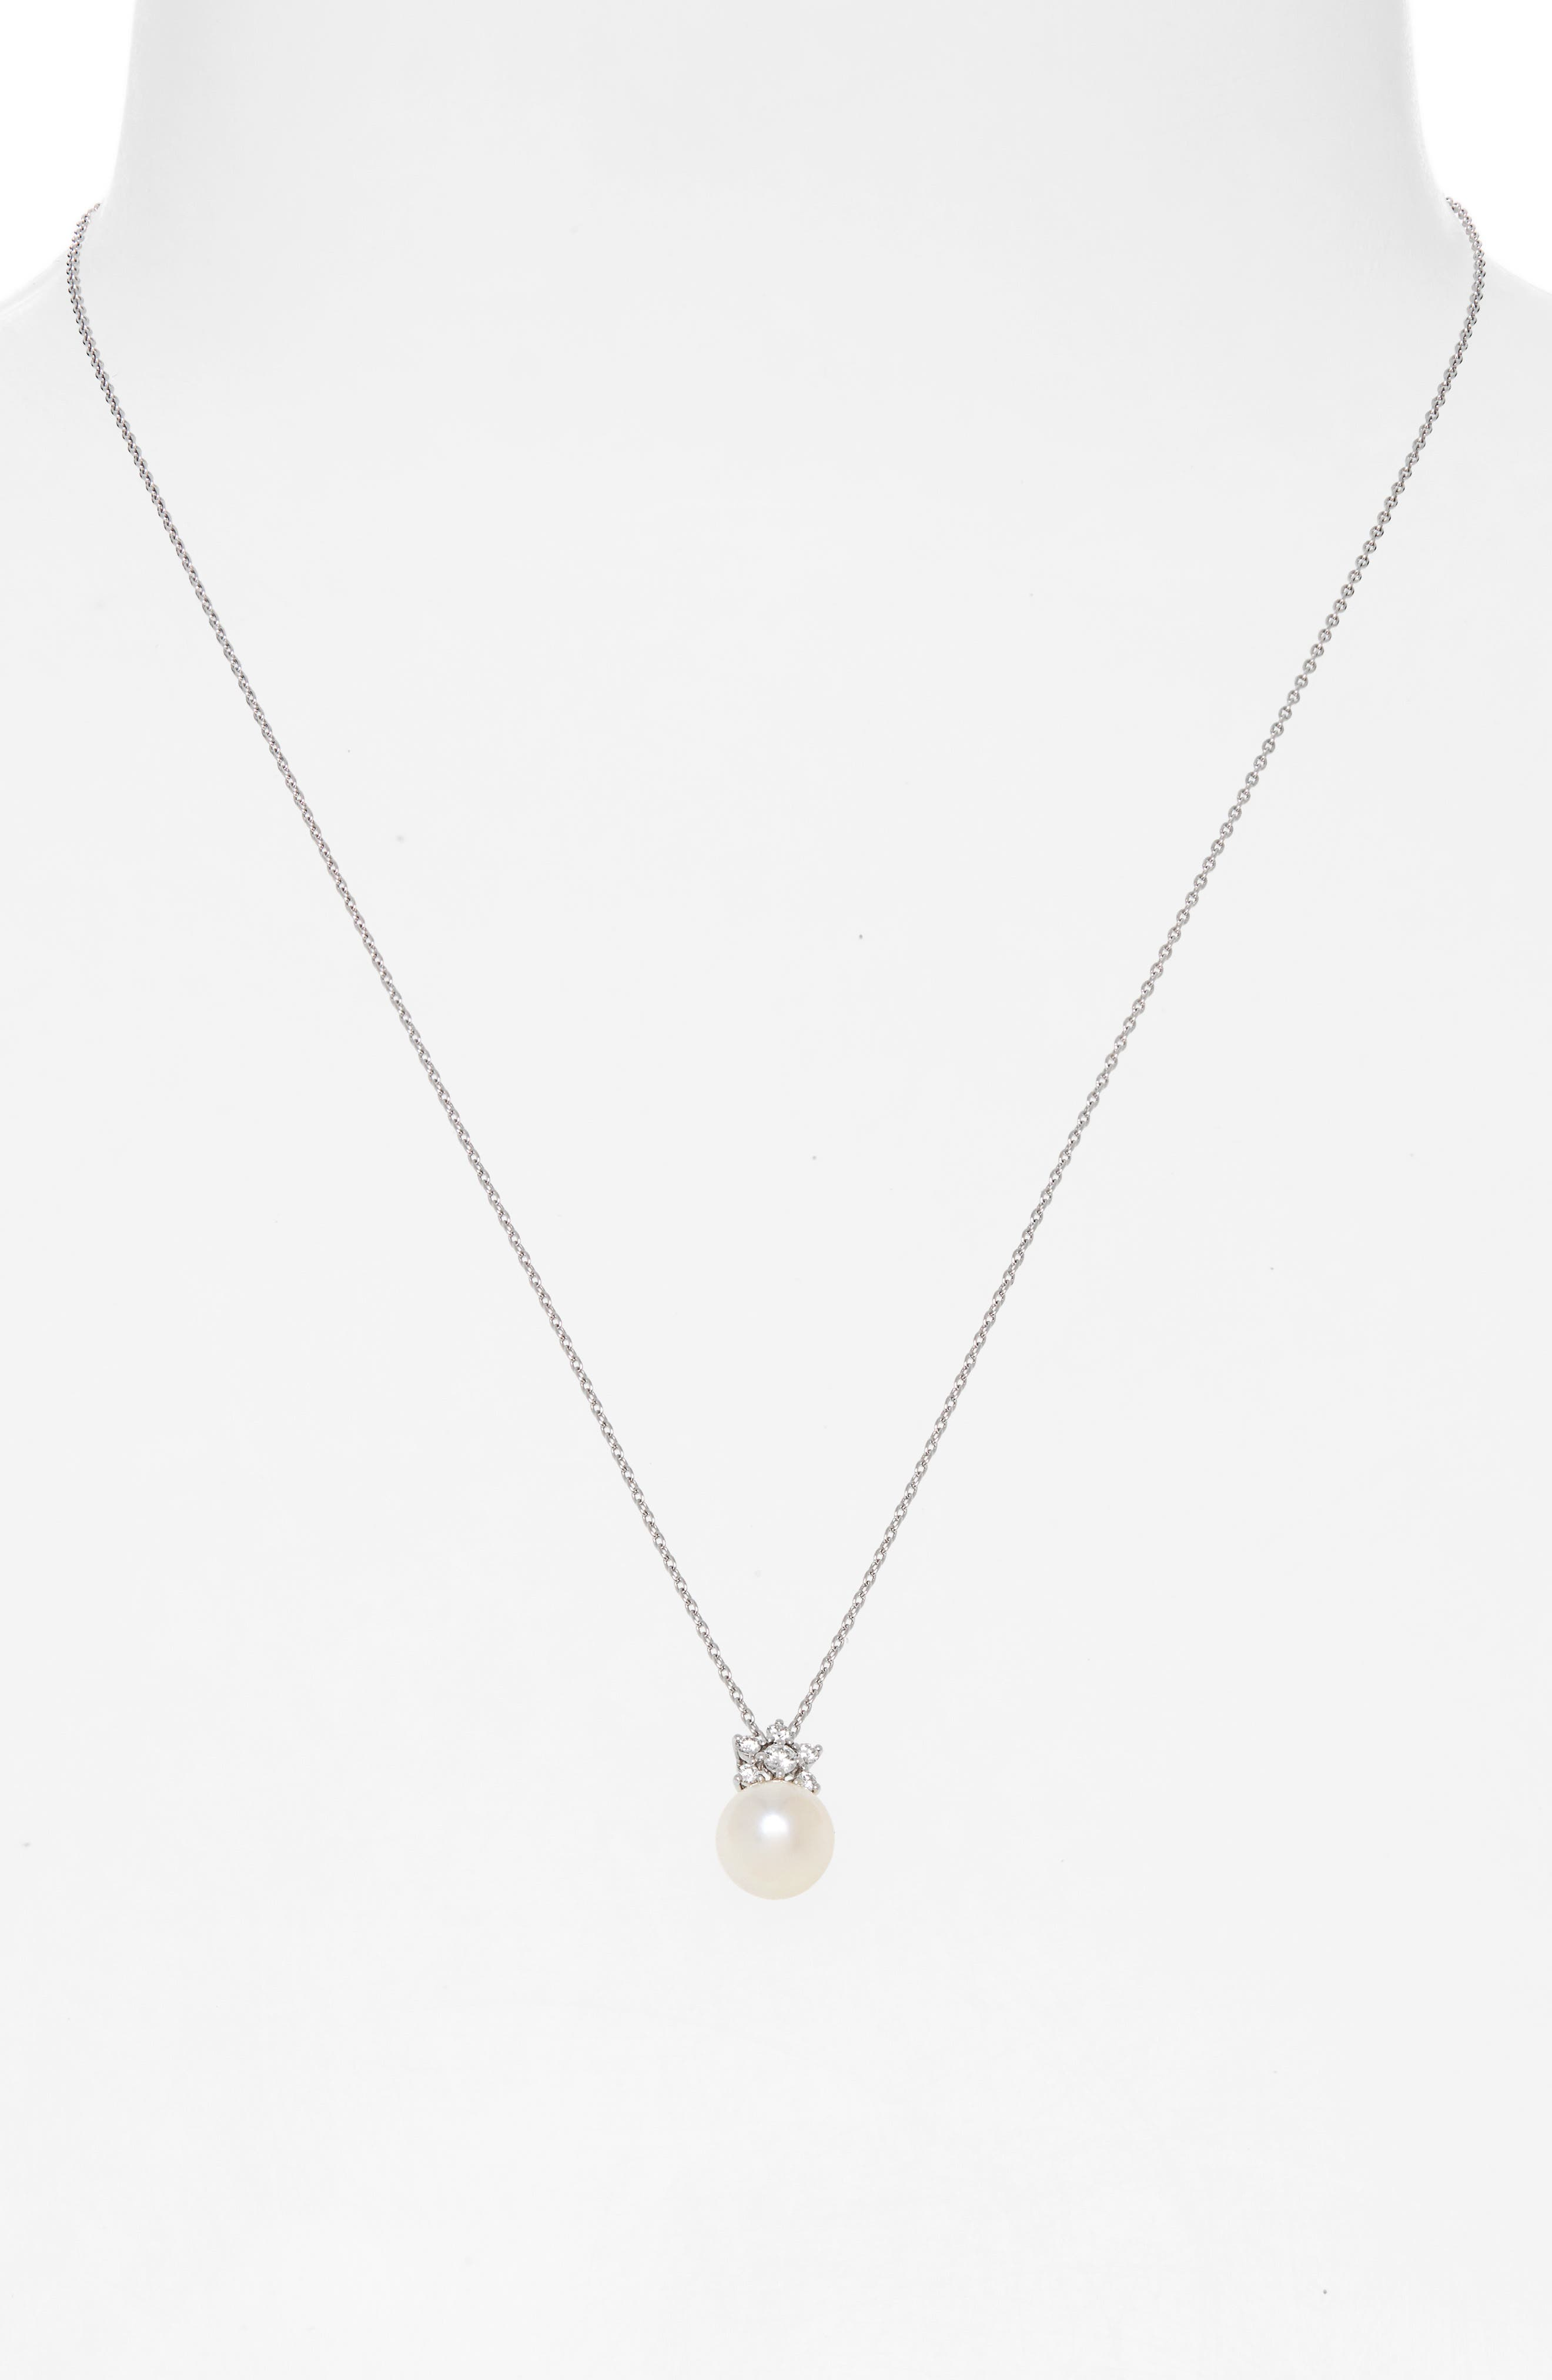 Akoya Cultured Pearl & Diamond Pendant Necklace